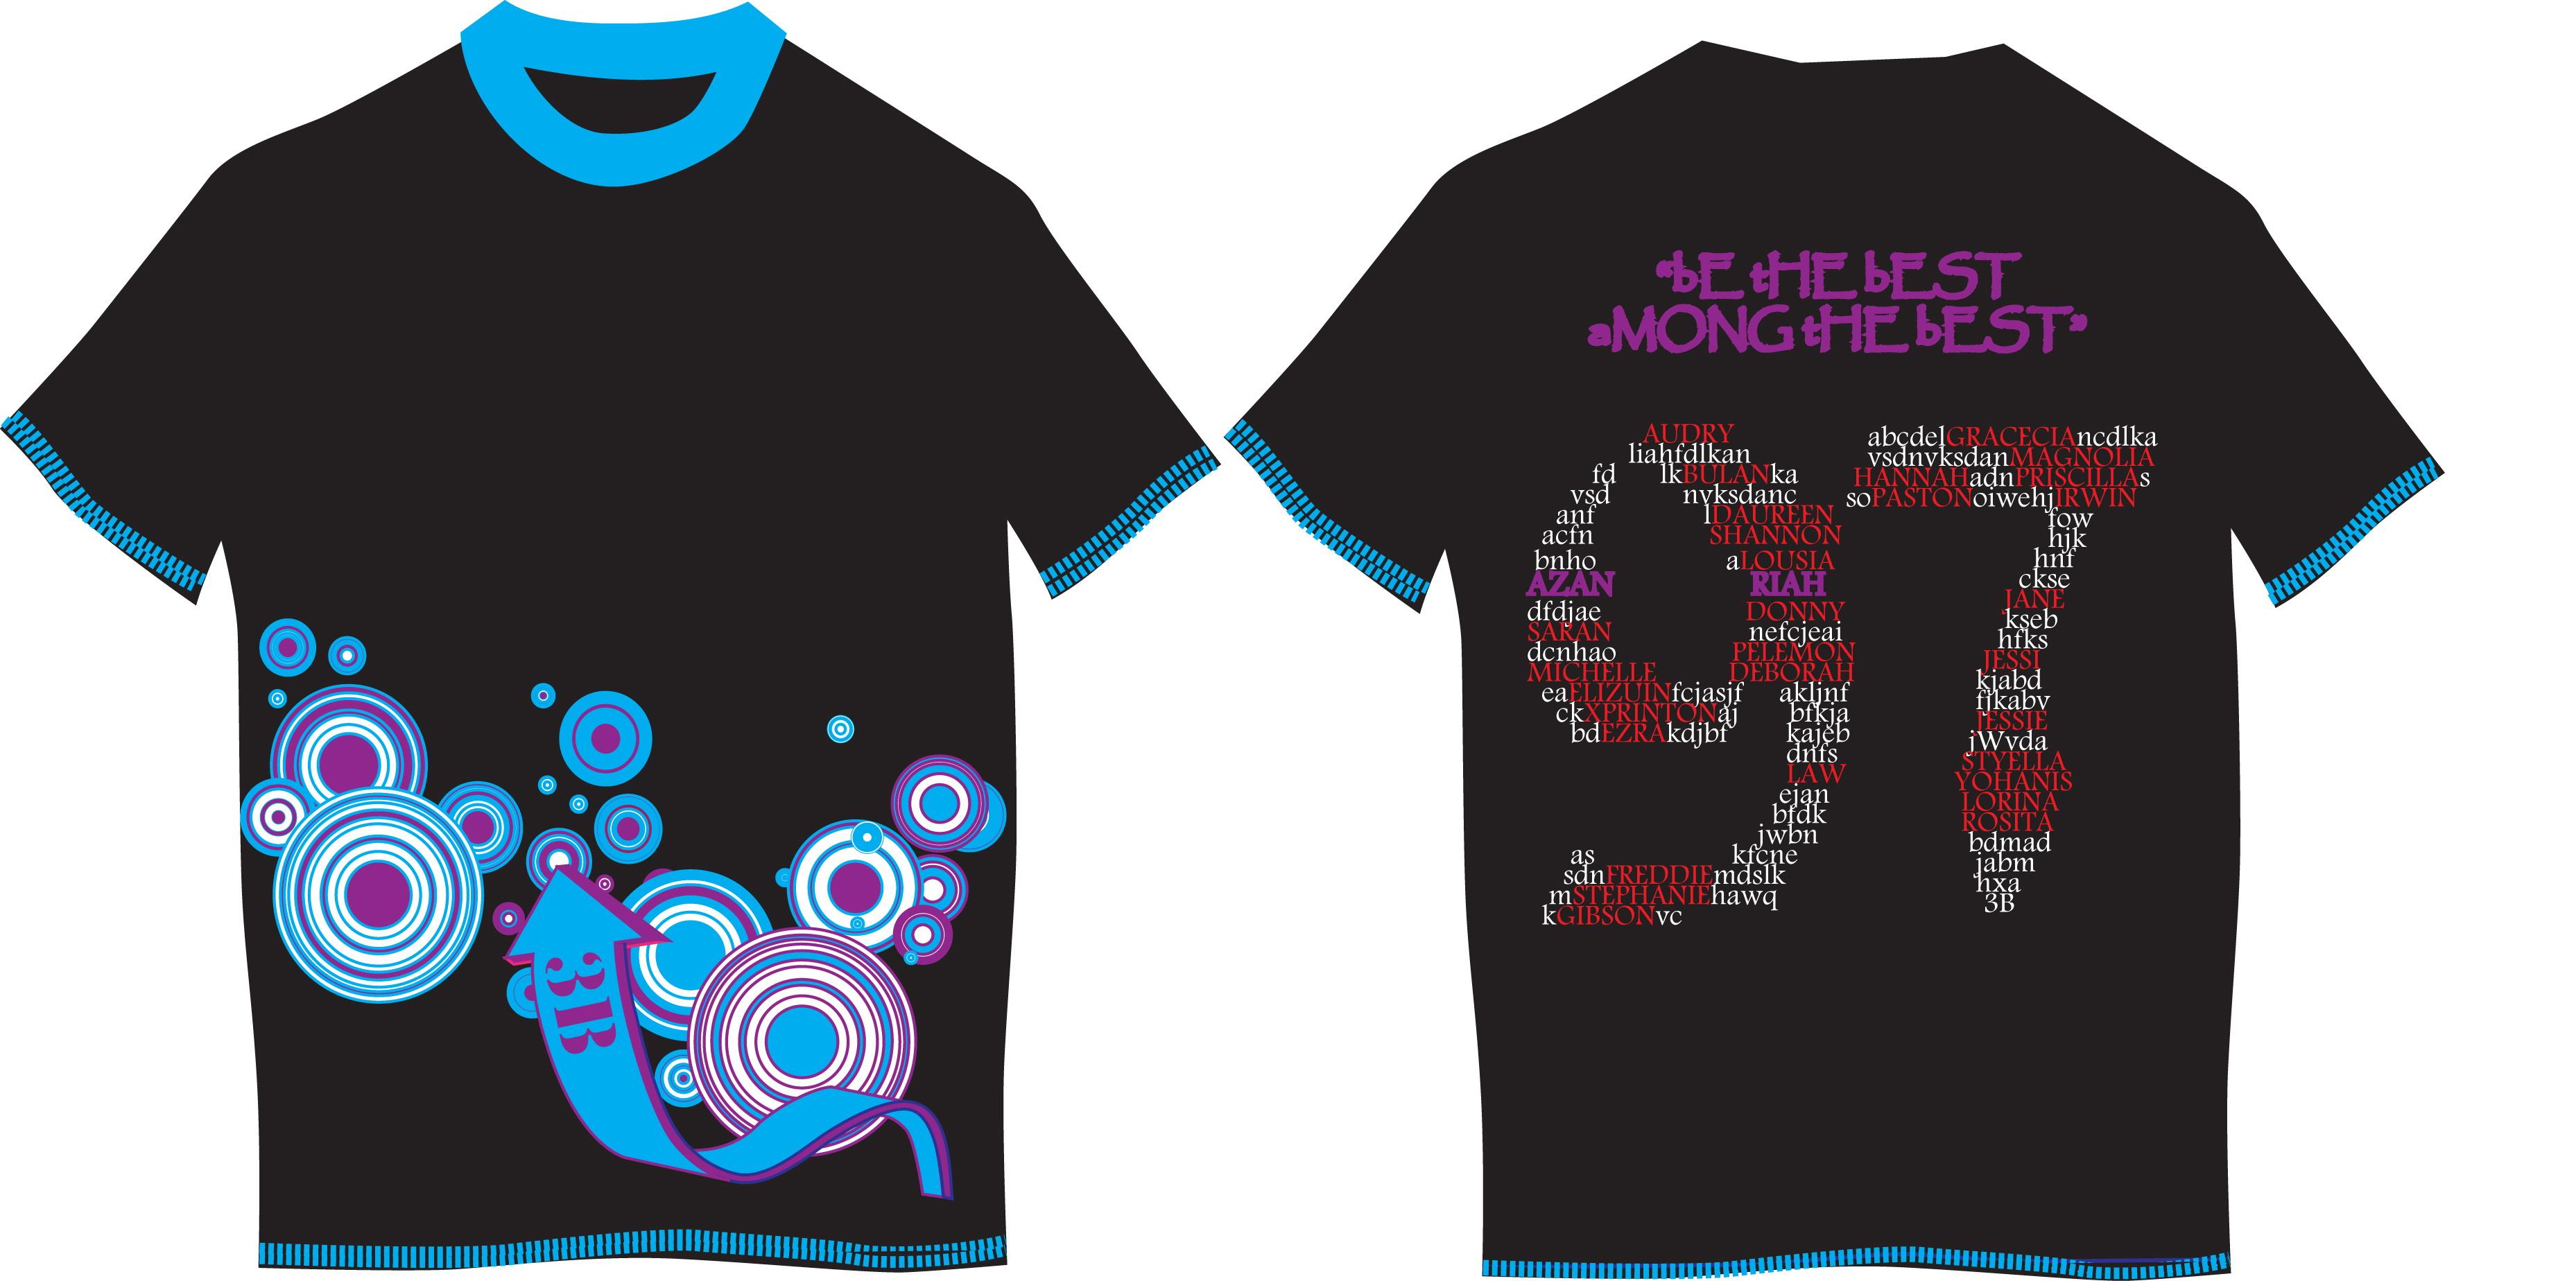 Designs contoh baju t shirt design baju berkolar shirt berkolar - Design T Shirt Rumah Sukan Cetak Baju Kelas Download Image Design T Shirt Rumah Sukan